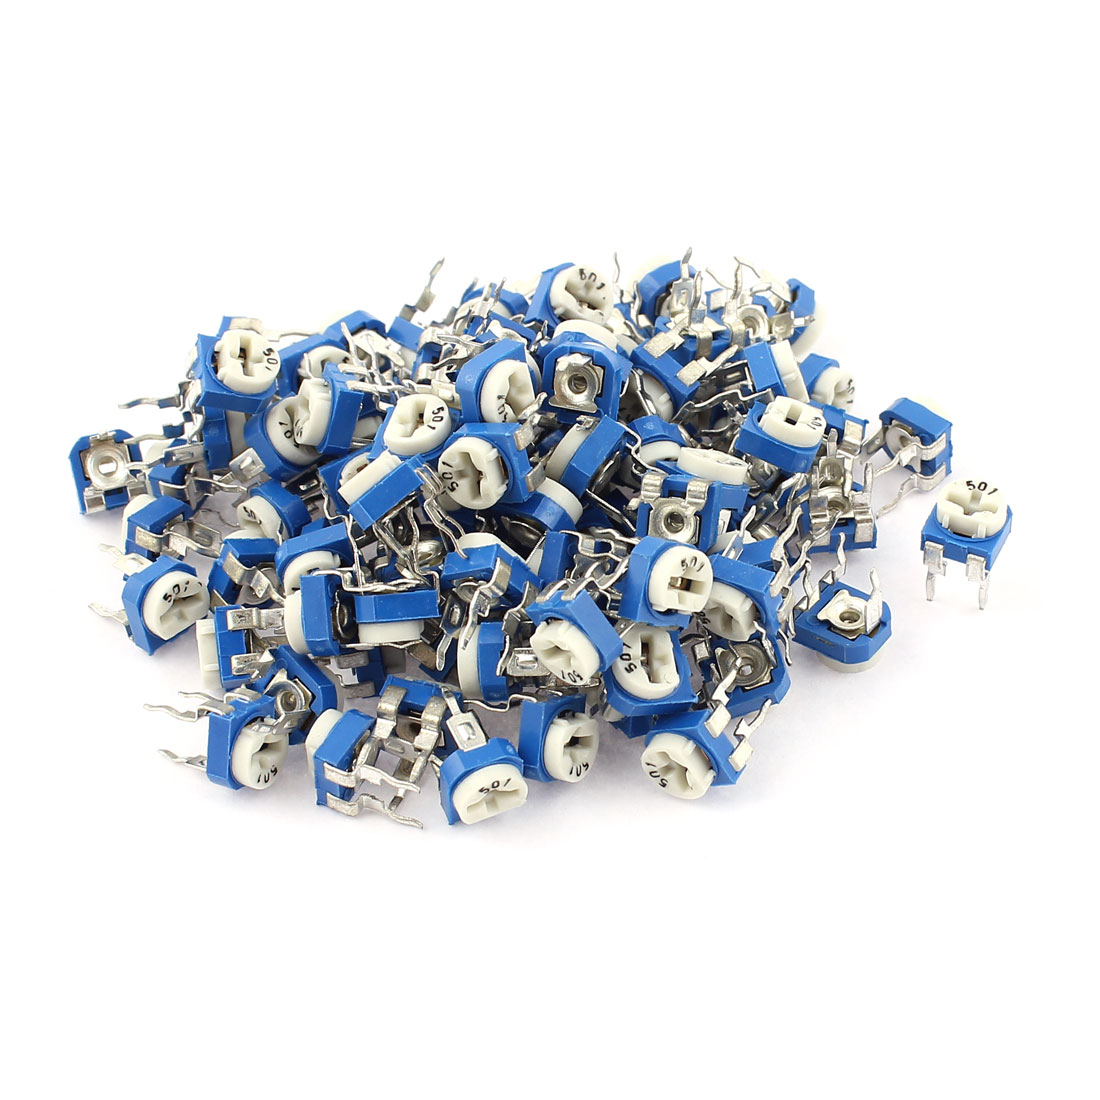 100Pcs 500 ohm Vertical PCB Preset Variable Resistor Trimmer Potentiometer Blue